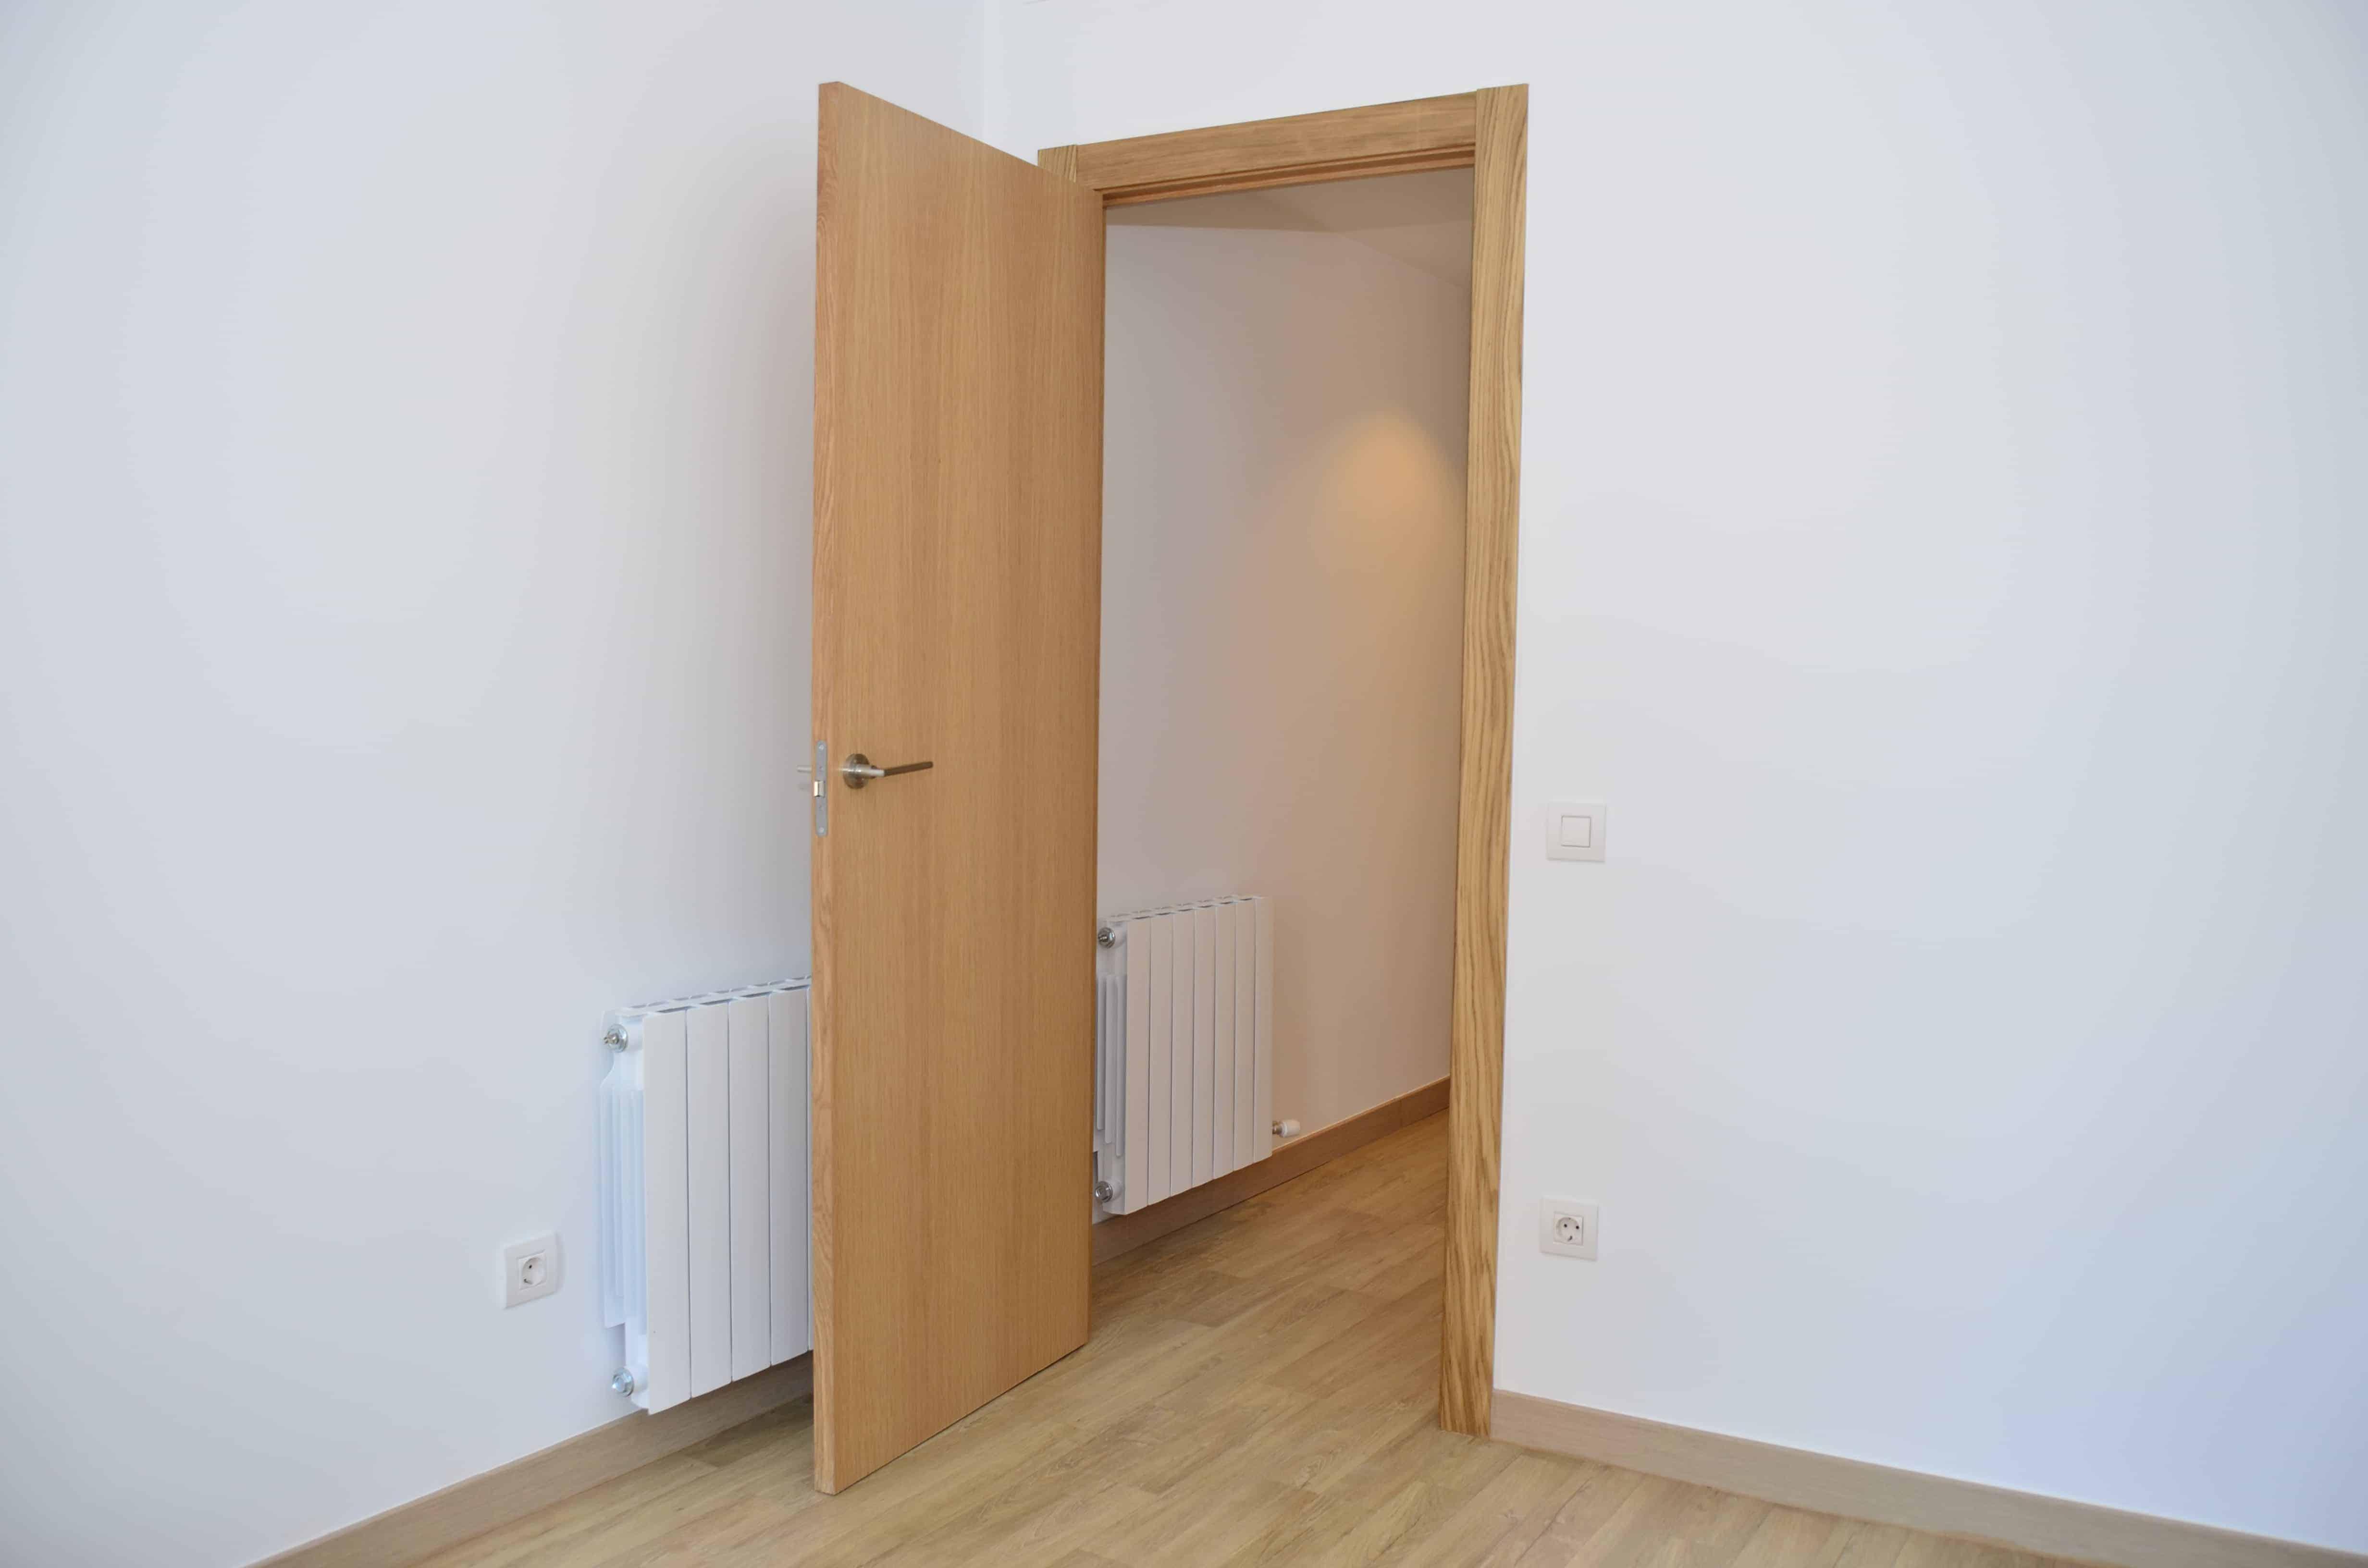 detalle puerta guifré contract solutions